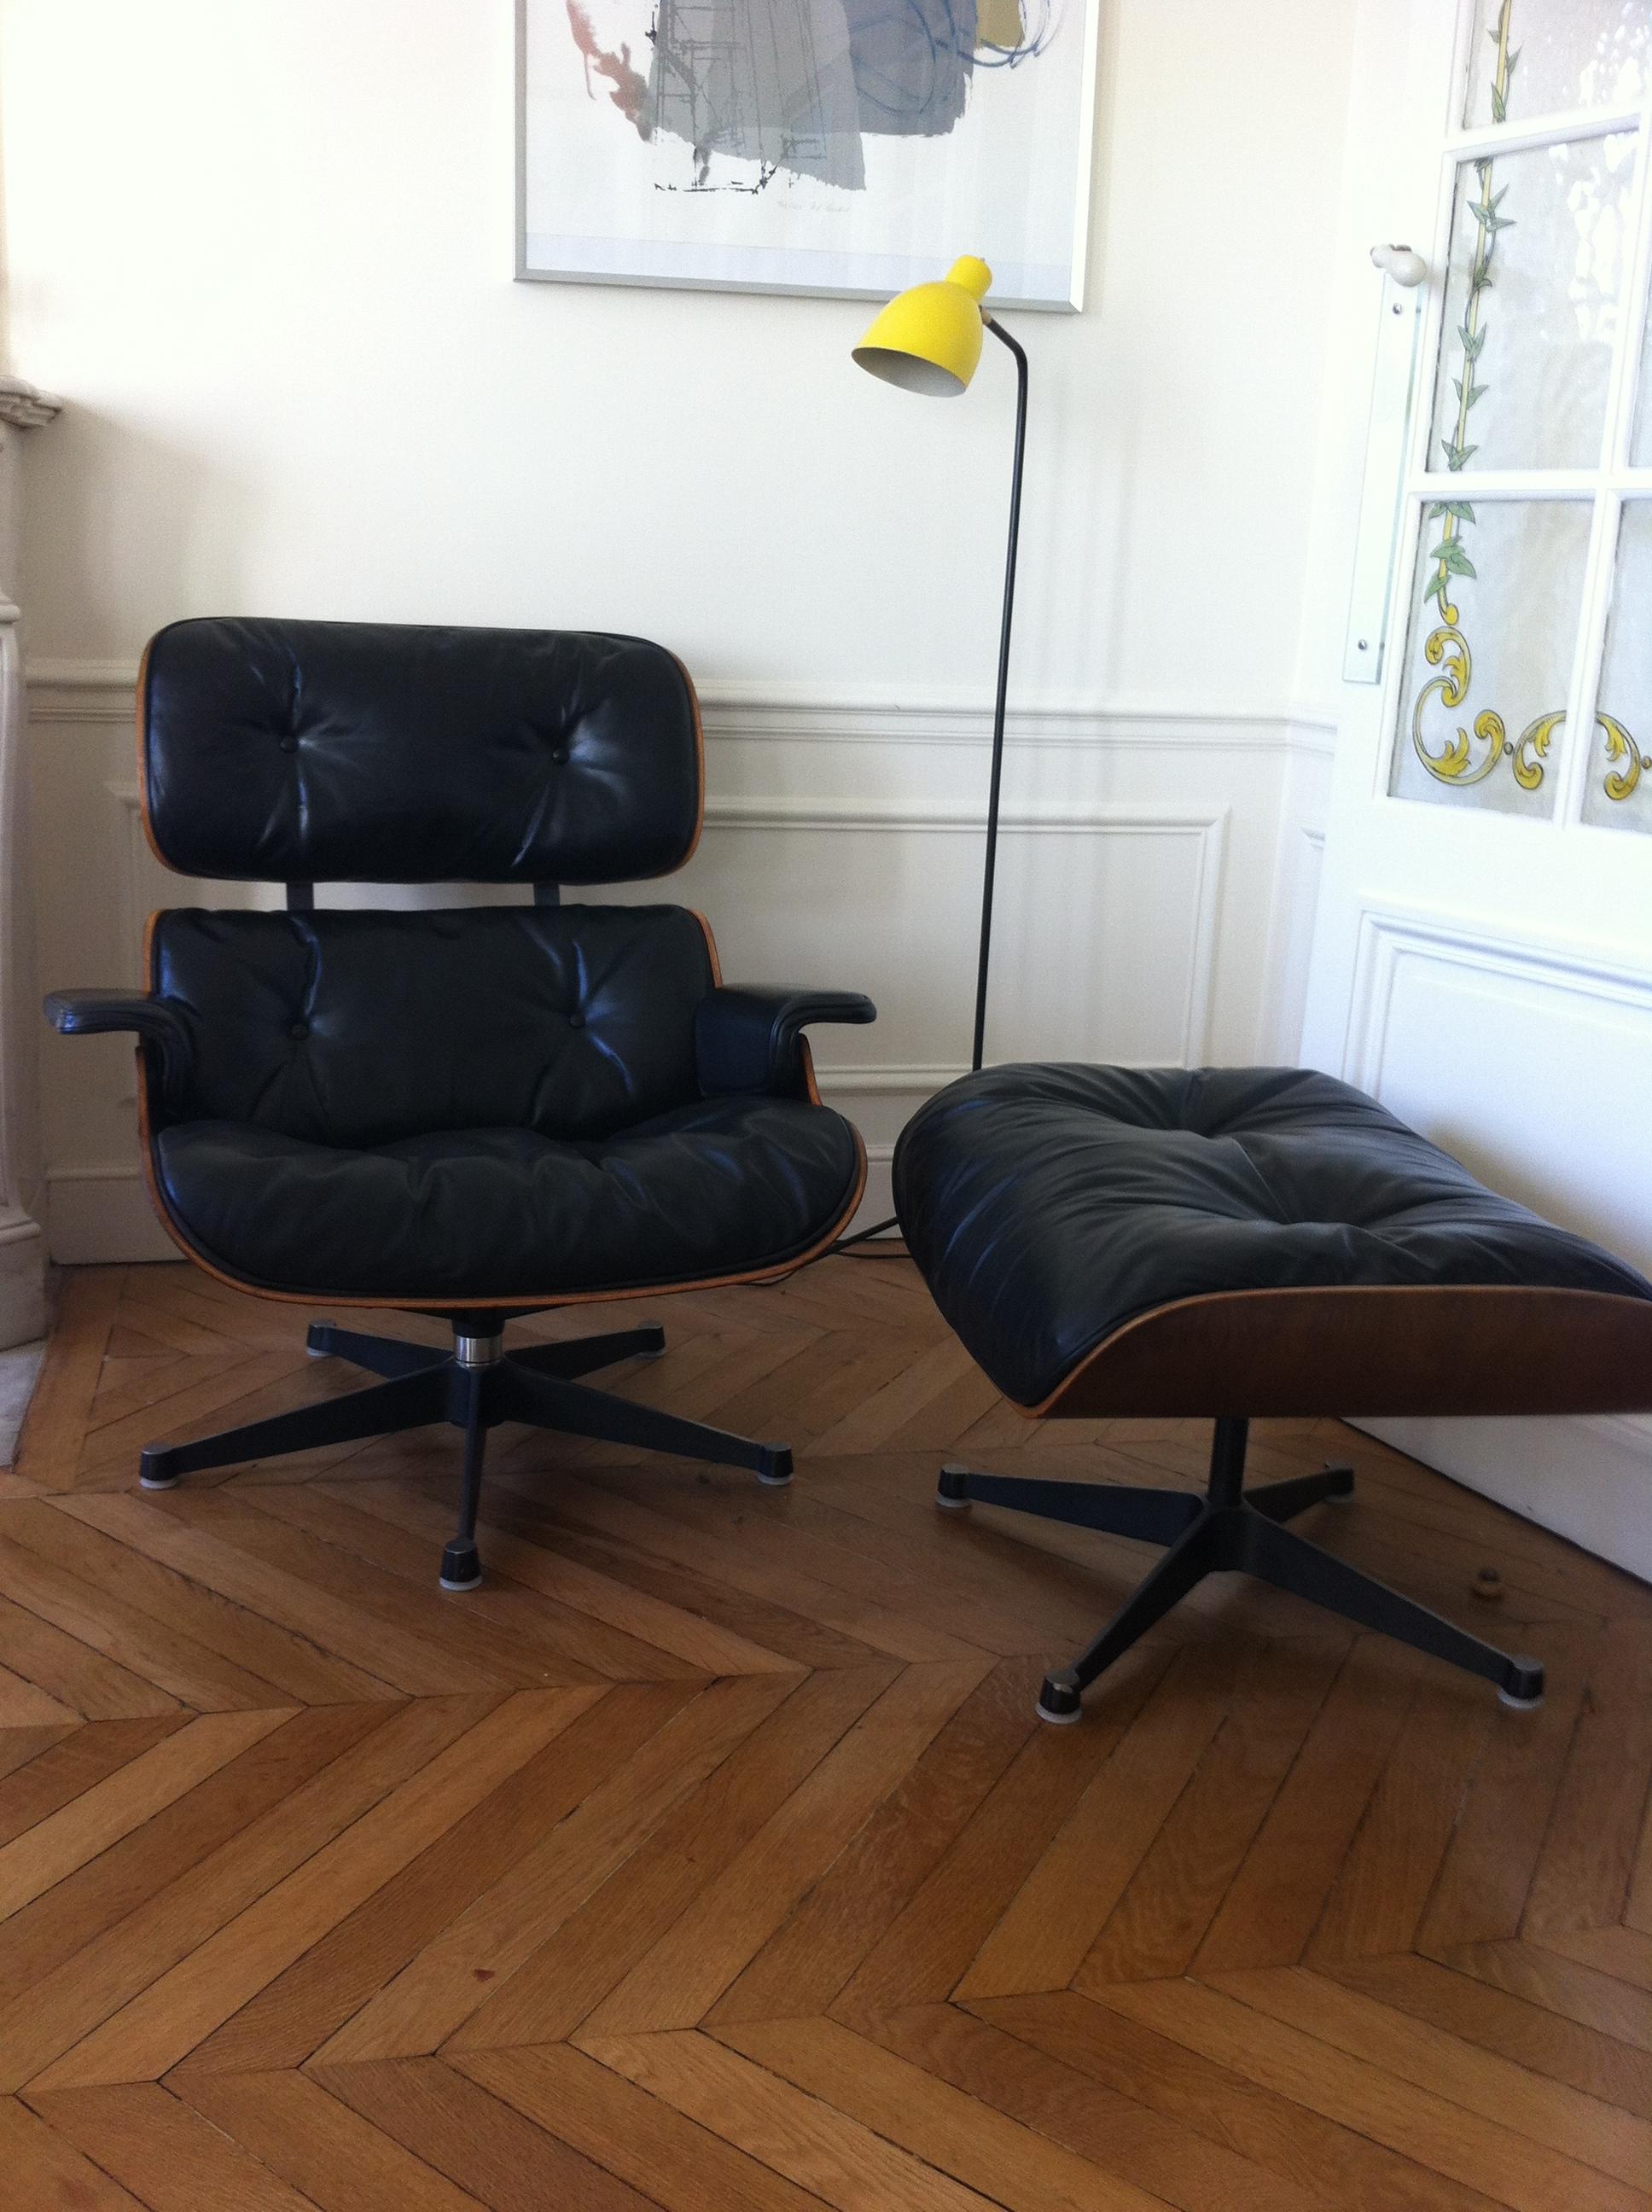 Fauteuil lounge chair eames dition herman miller l for Fauteuil bois eames